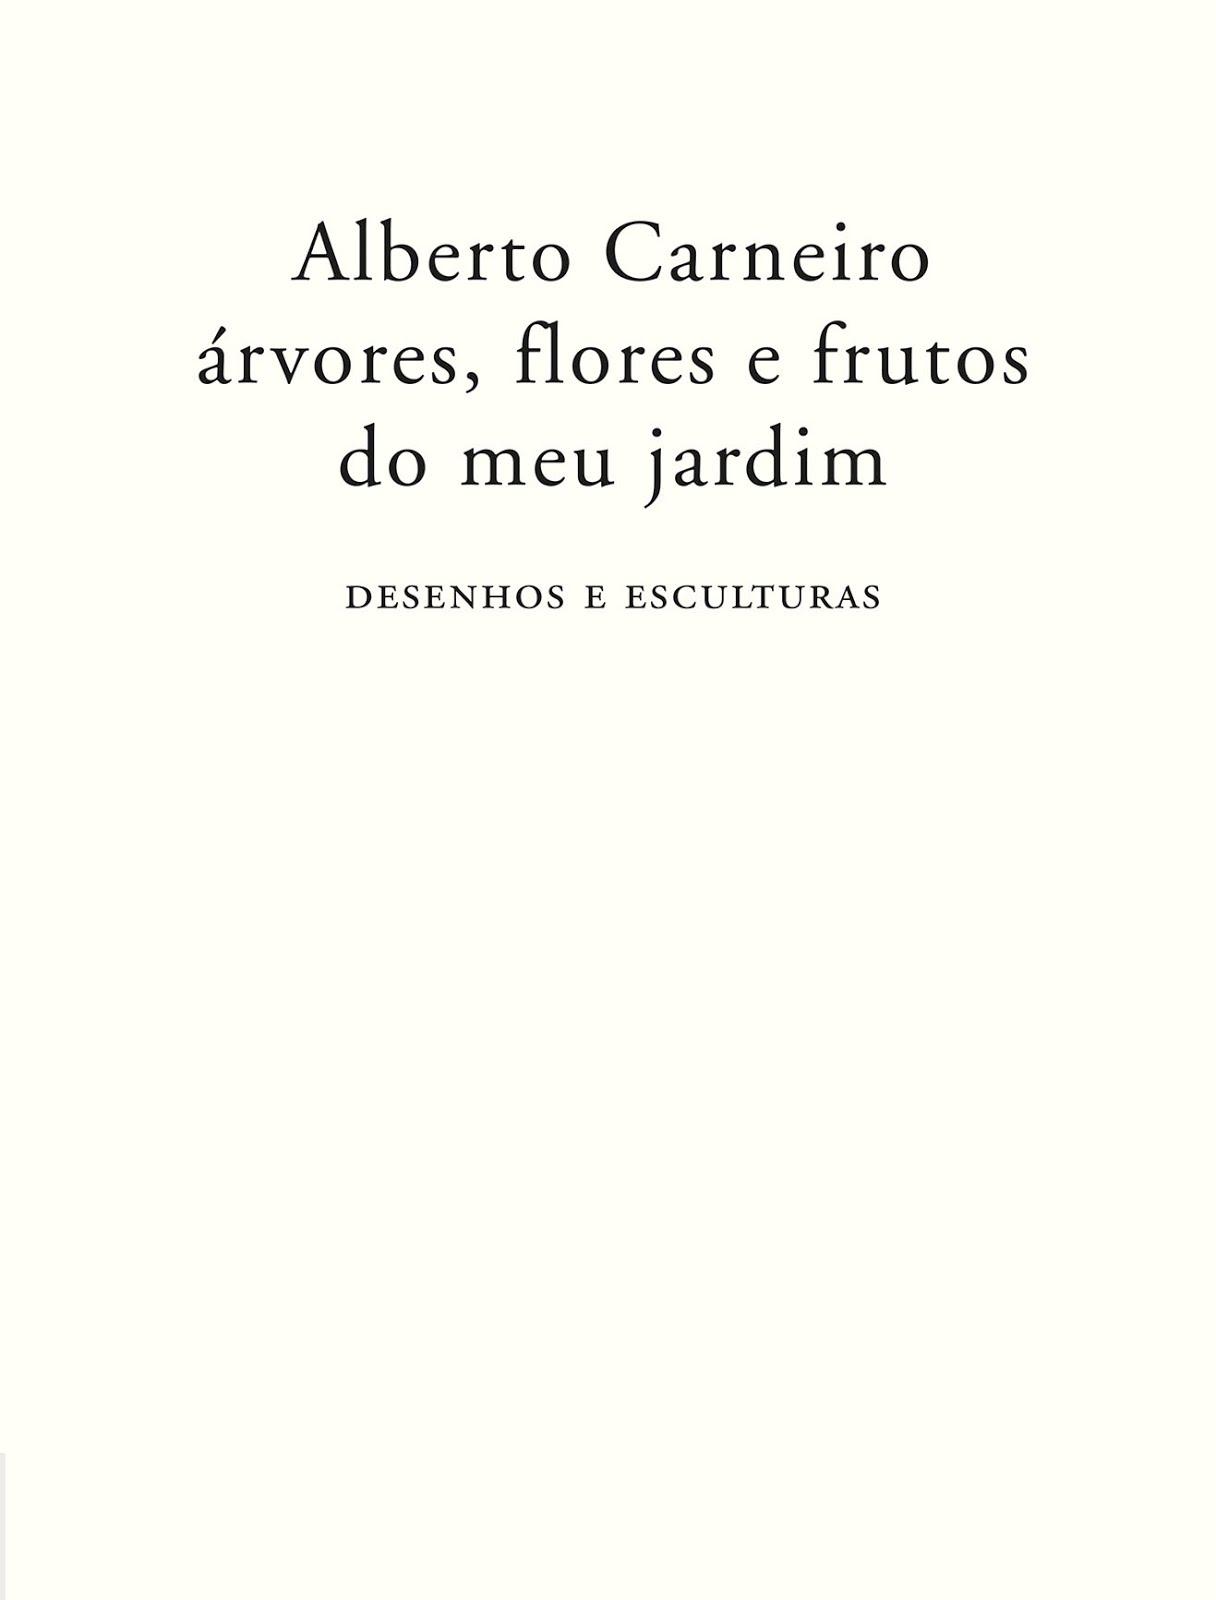 ALBERTO CARNEIRO I 1937-2017